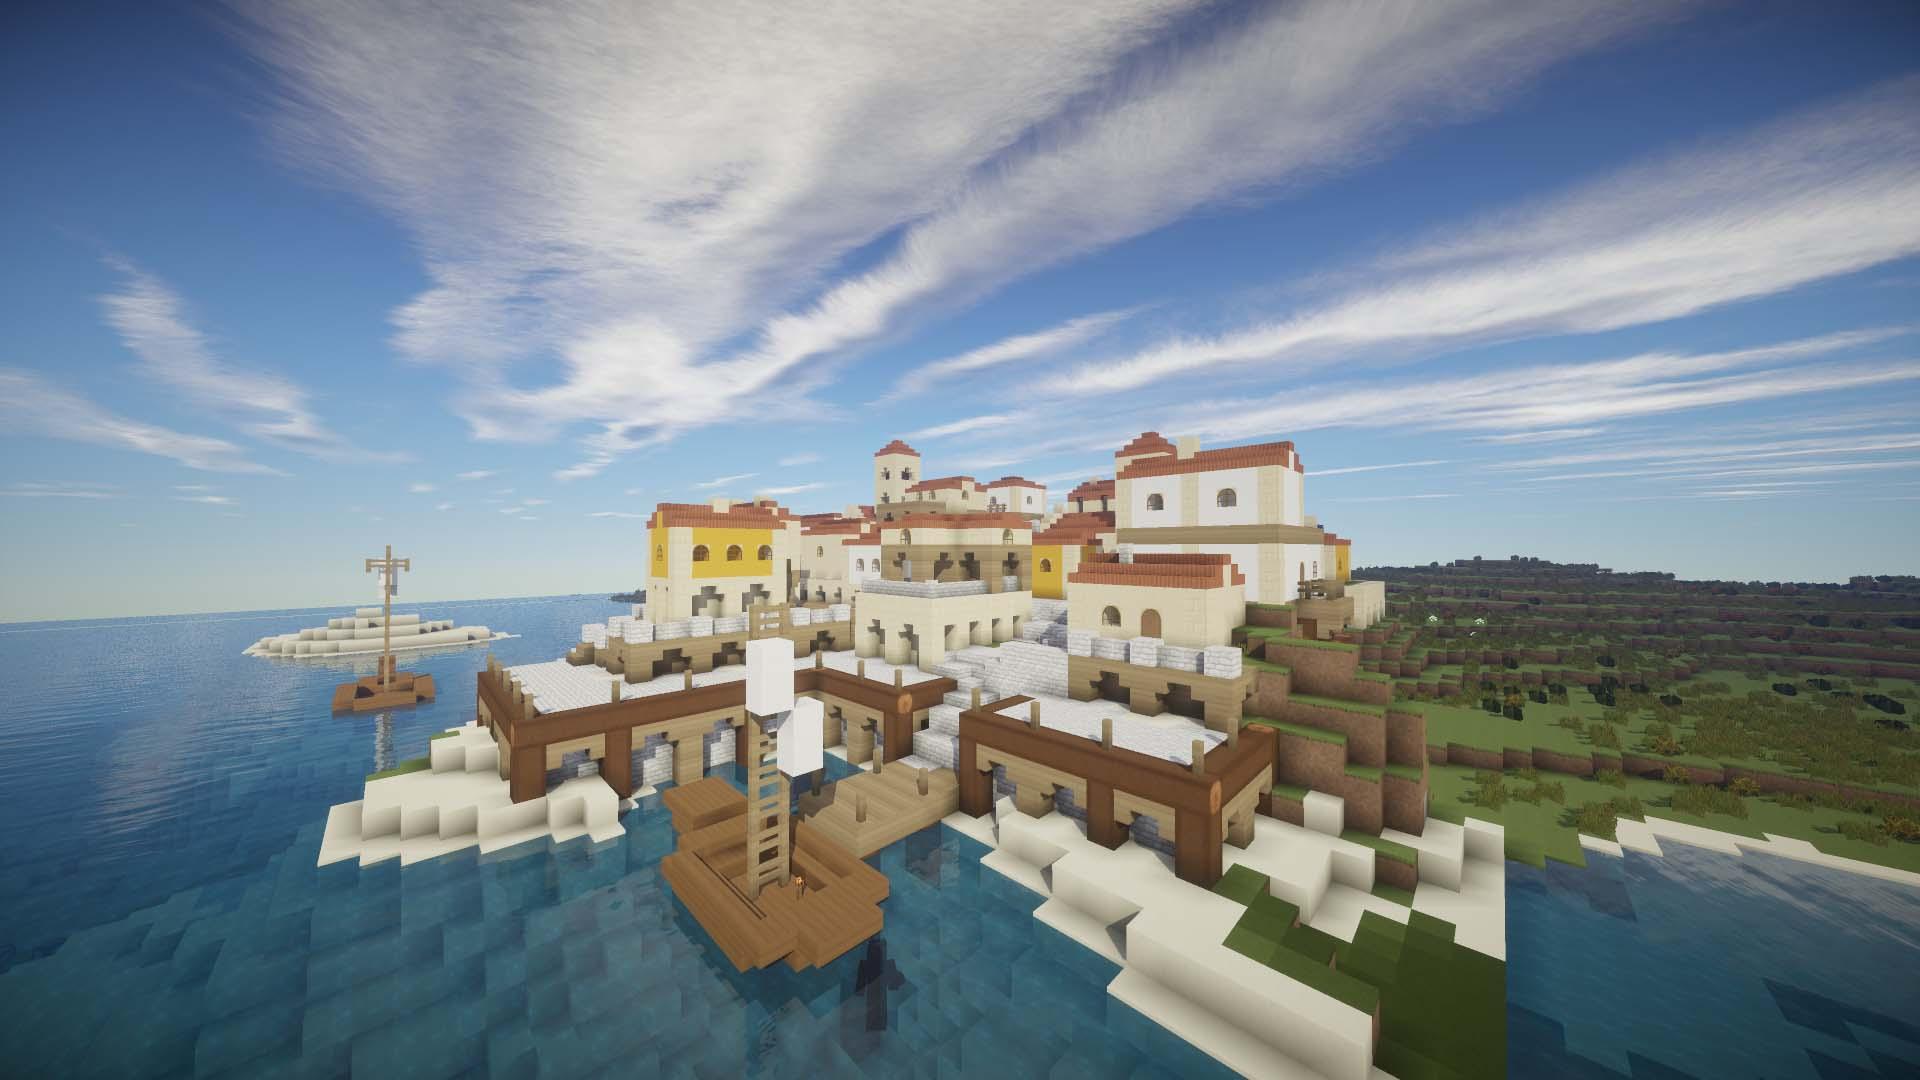 Hình ảnh Minecraft 3D đẹp